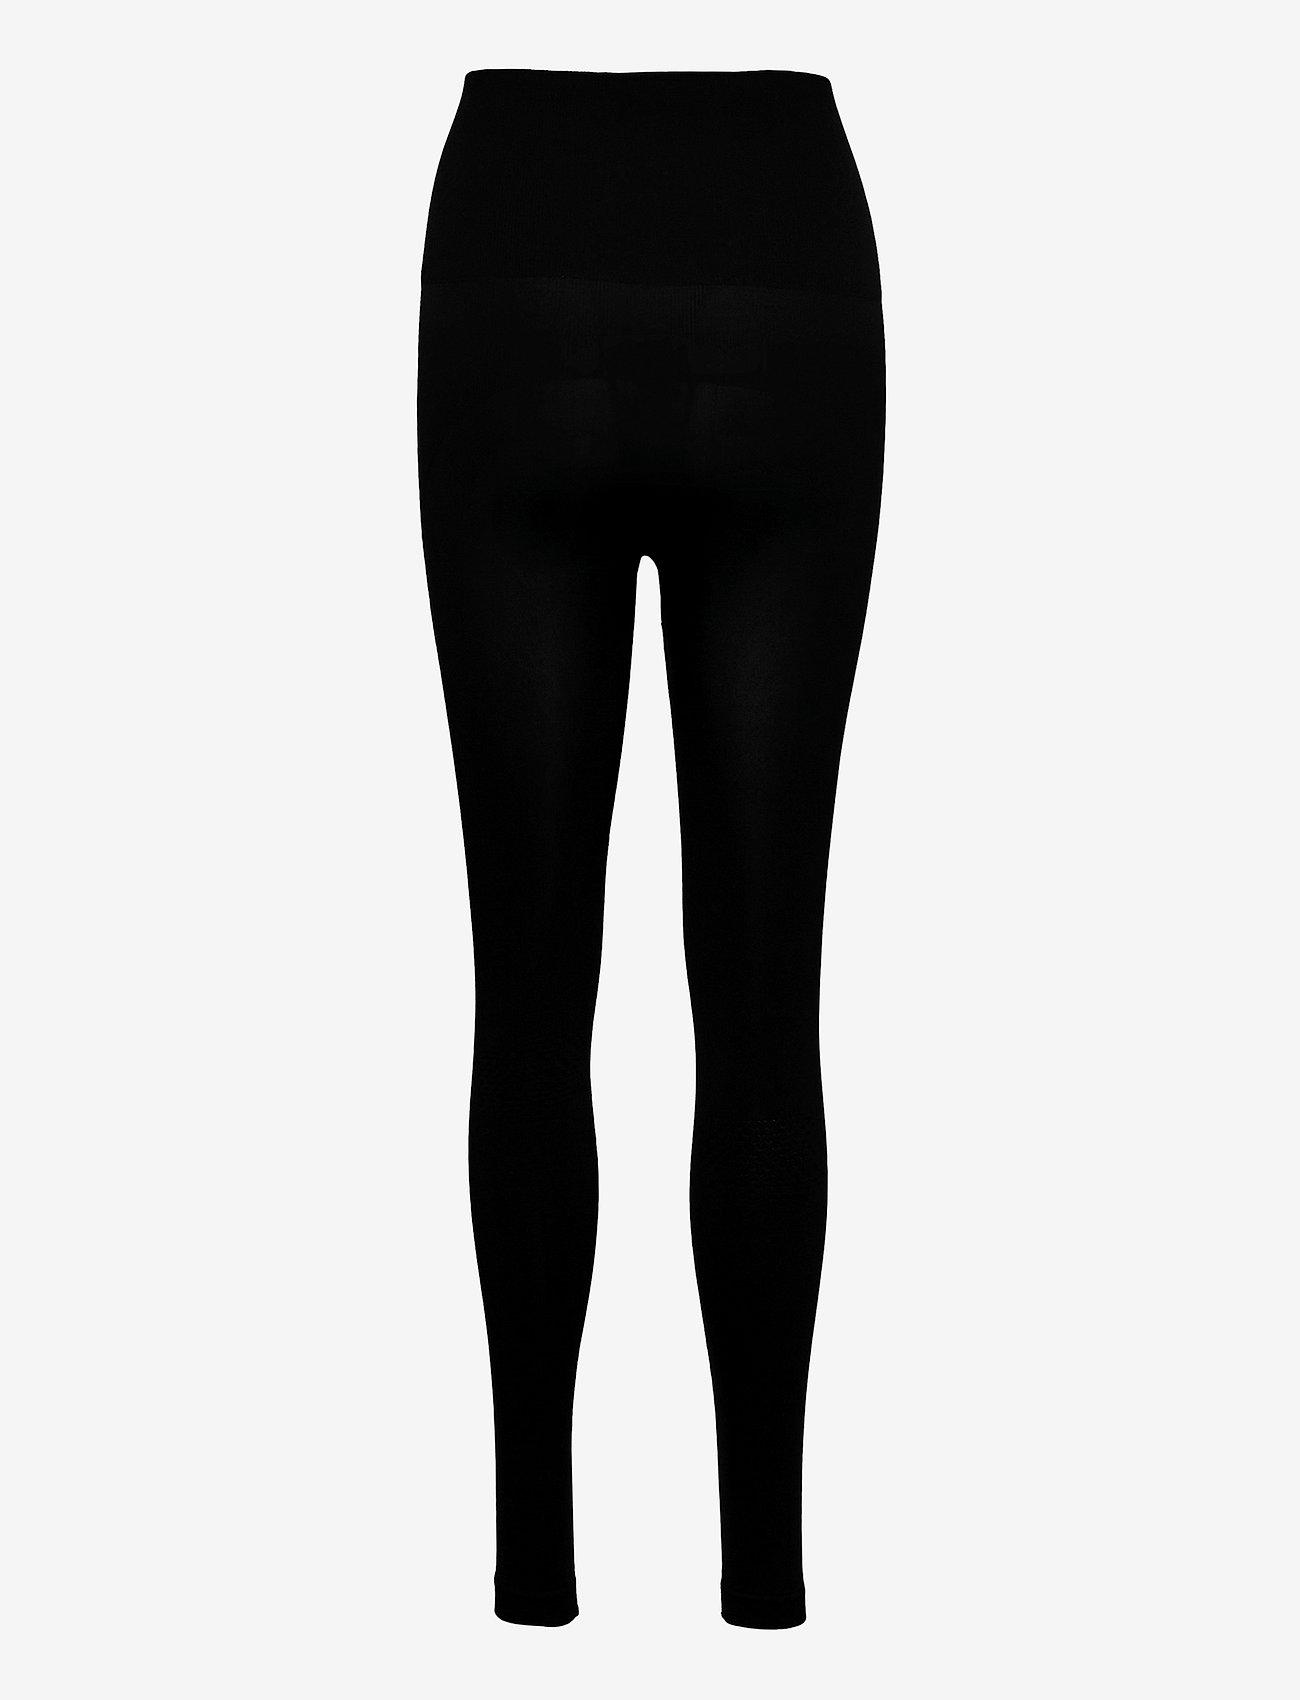 Boob - Support leggings - leggings - black - 1